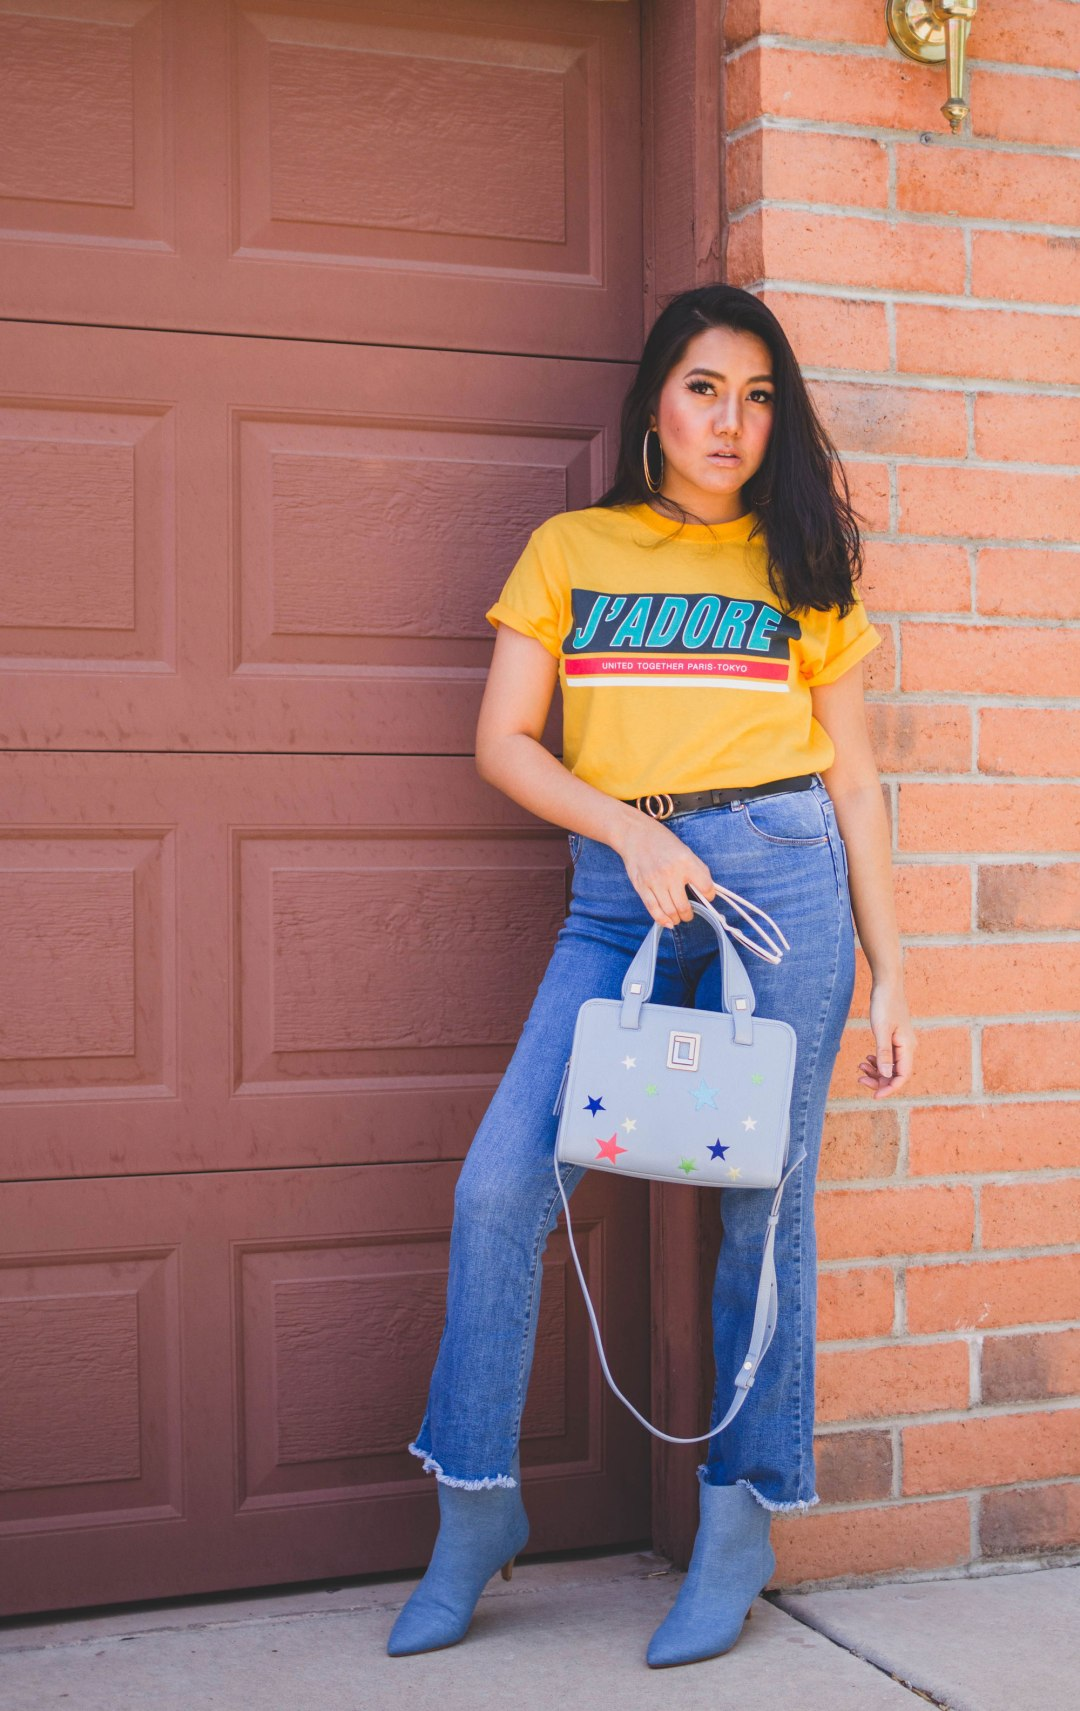 Arizona Fashion blogger Molly Larsen Wearing yellow J'ADORE Tee with blue denim jeans